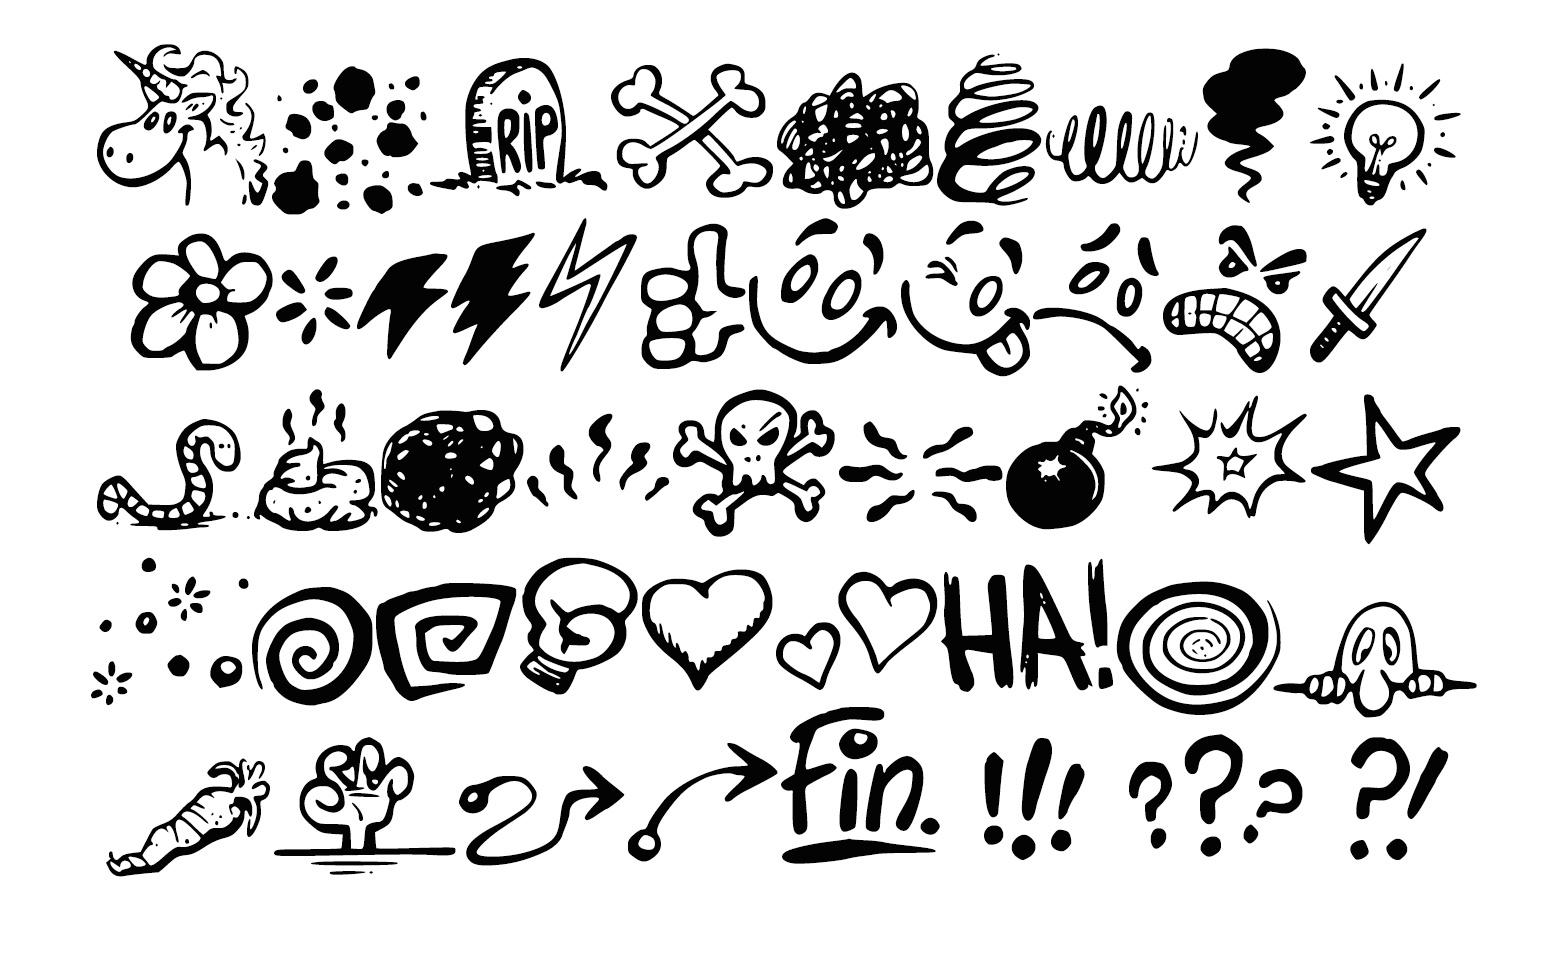 Georg's COMIC FONTS: 11 Handwritten Lettering Font Bun - Georg's